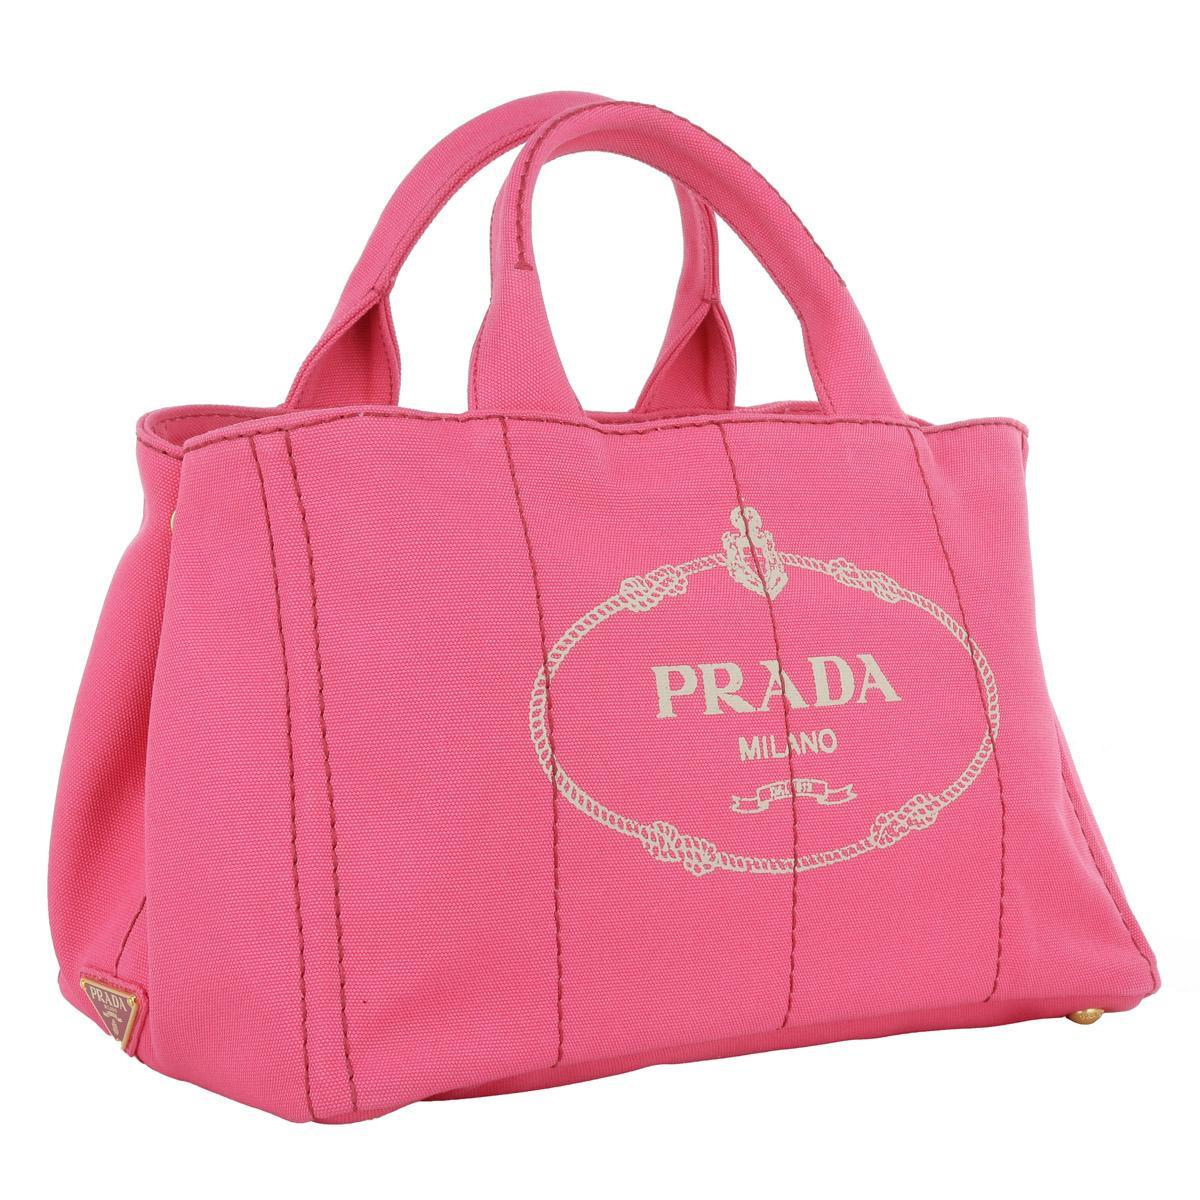 4593023e8888ae Prada Canapa Shopping Bag Peonia - Lyst